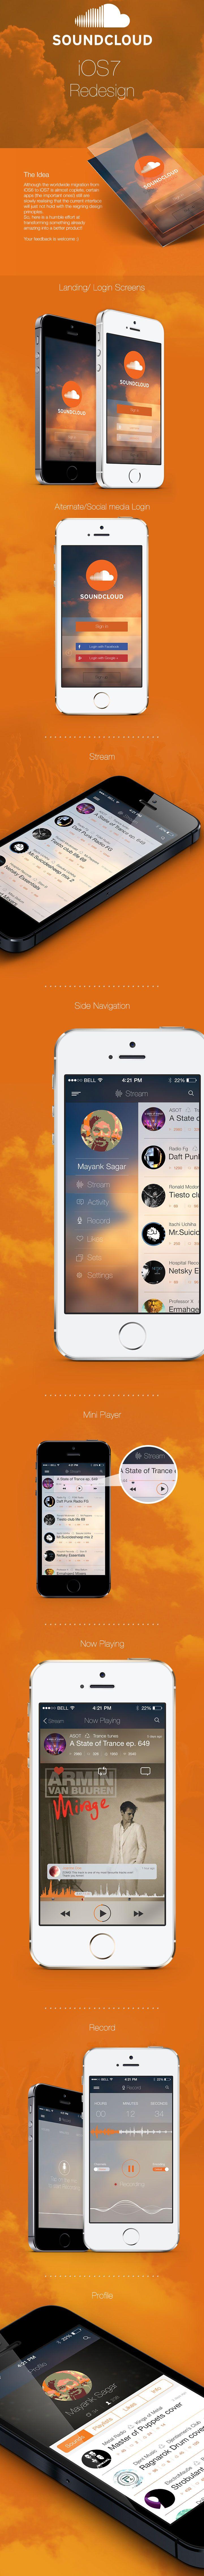 Soundcloud app iOS7 redesign #ui #app #ios